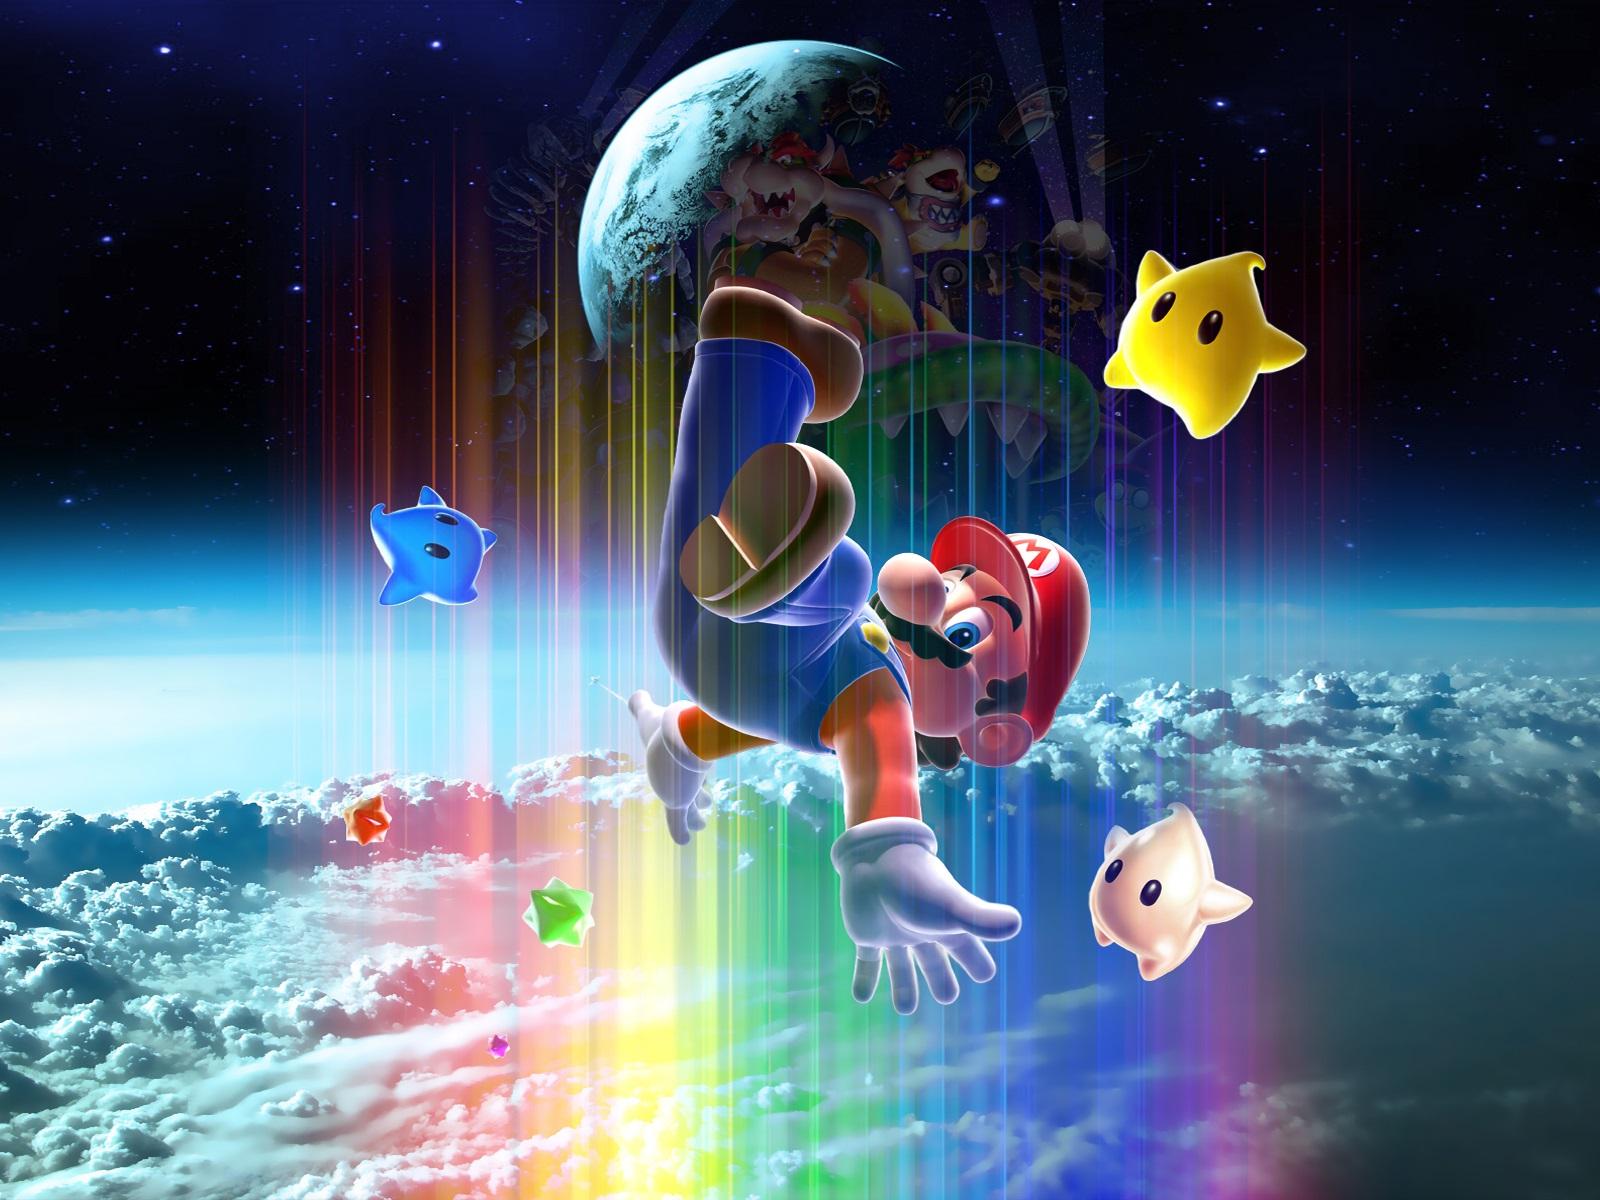 Download Wallpaper 1600x1200 Super Mario, classic game